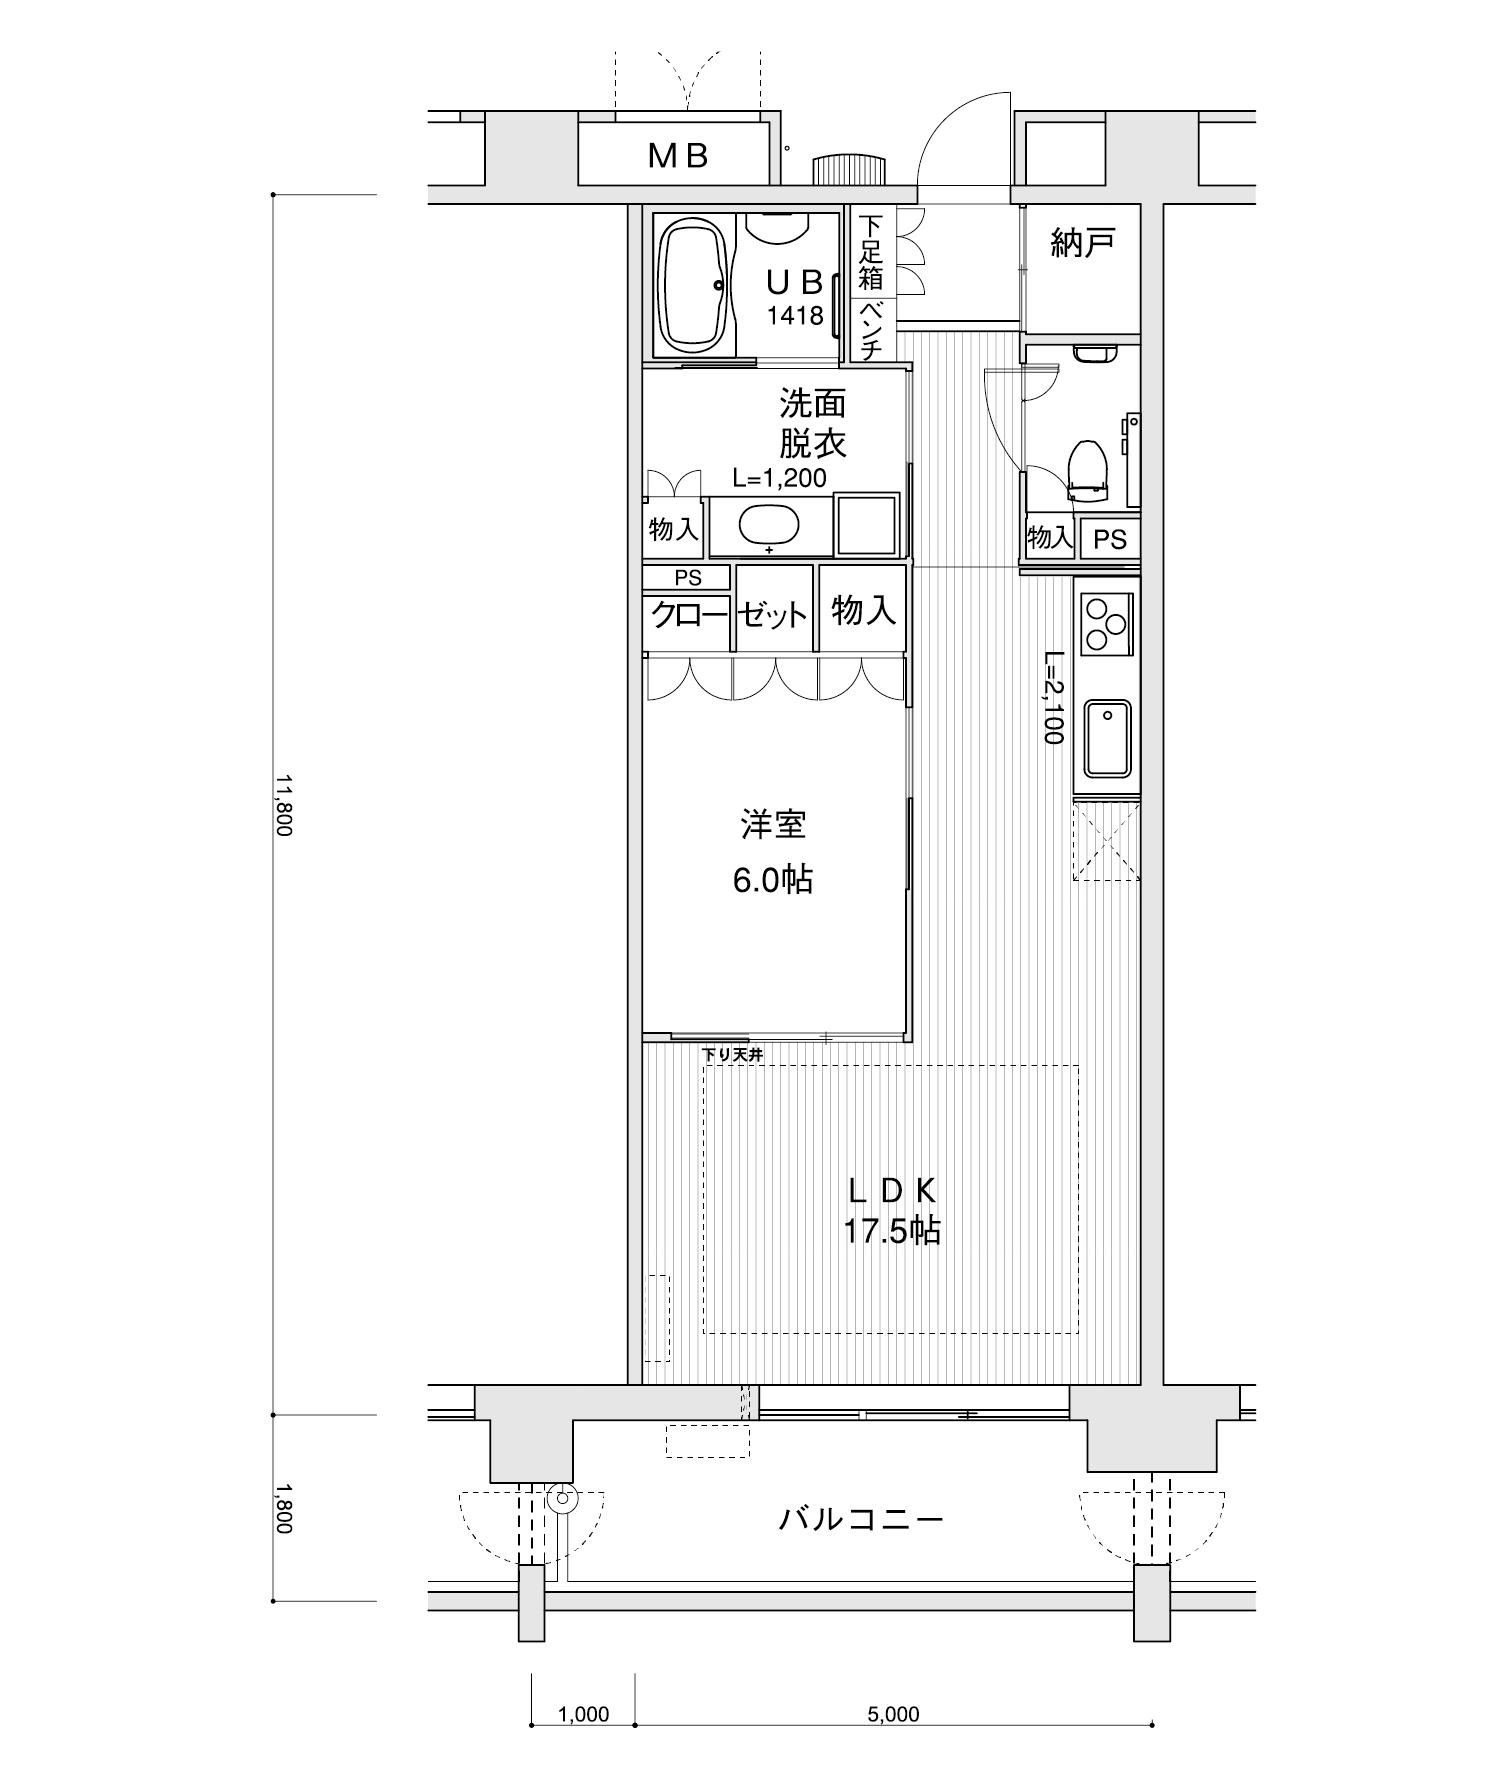 2202-B11LDK+納戸専有面積 / 59.00m²